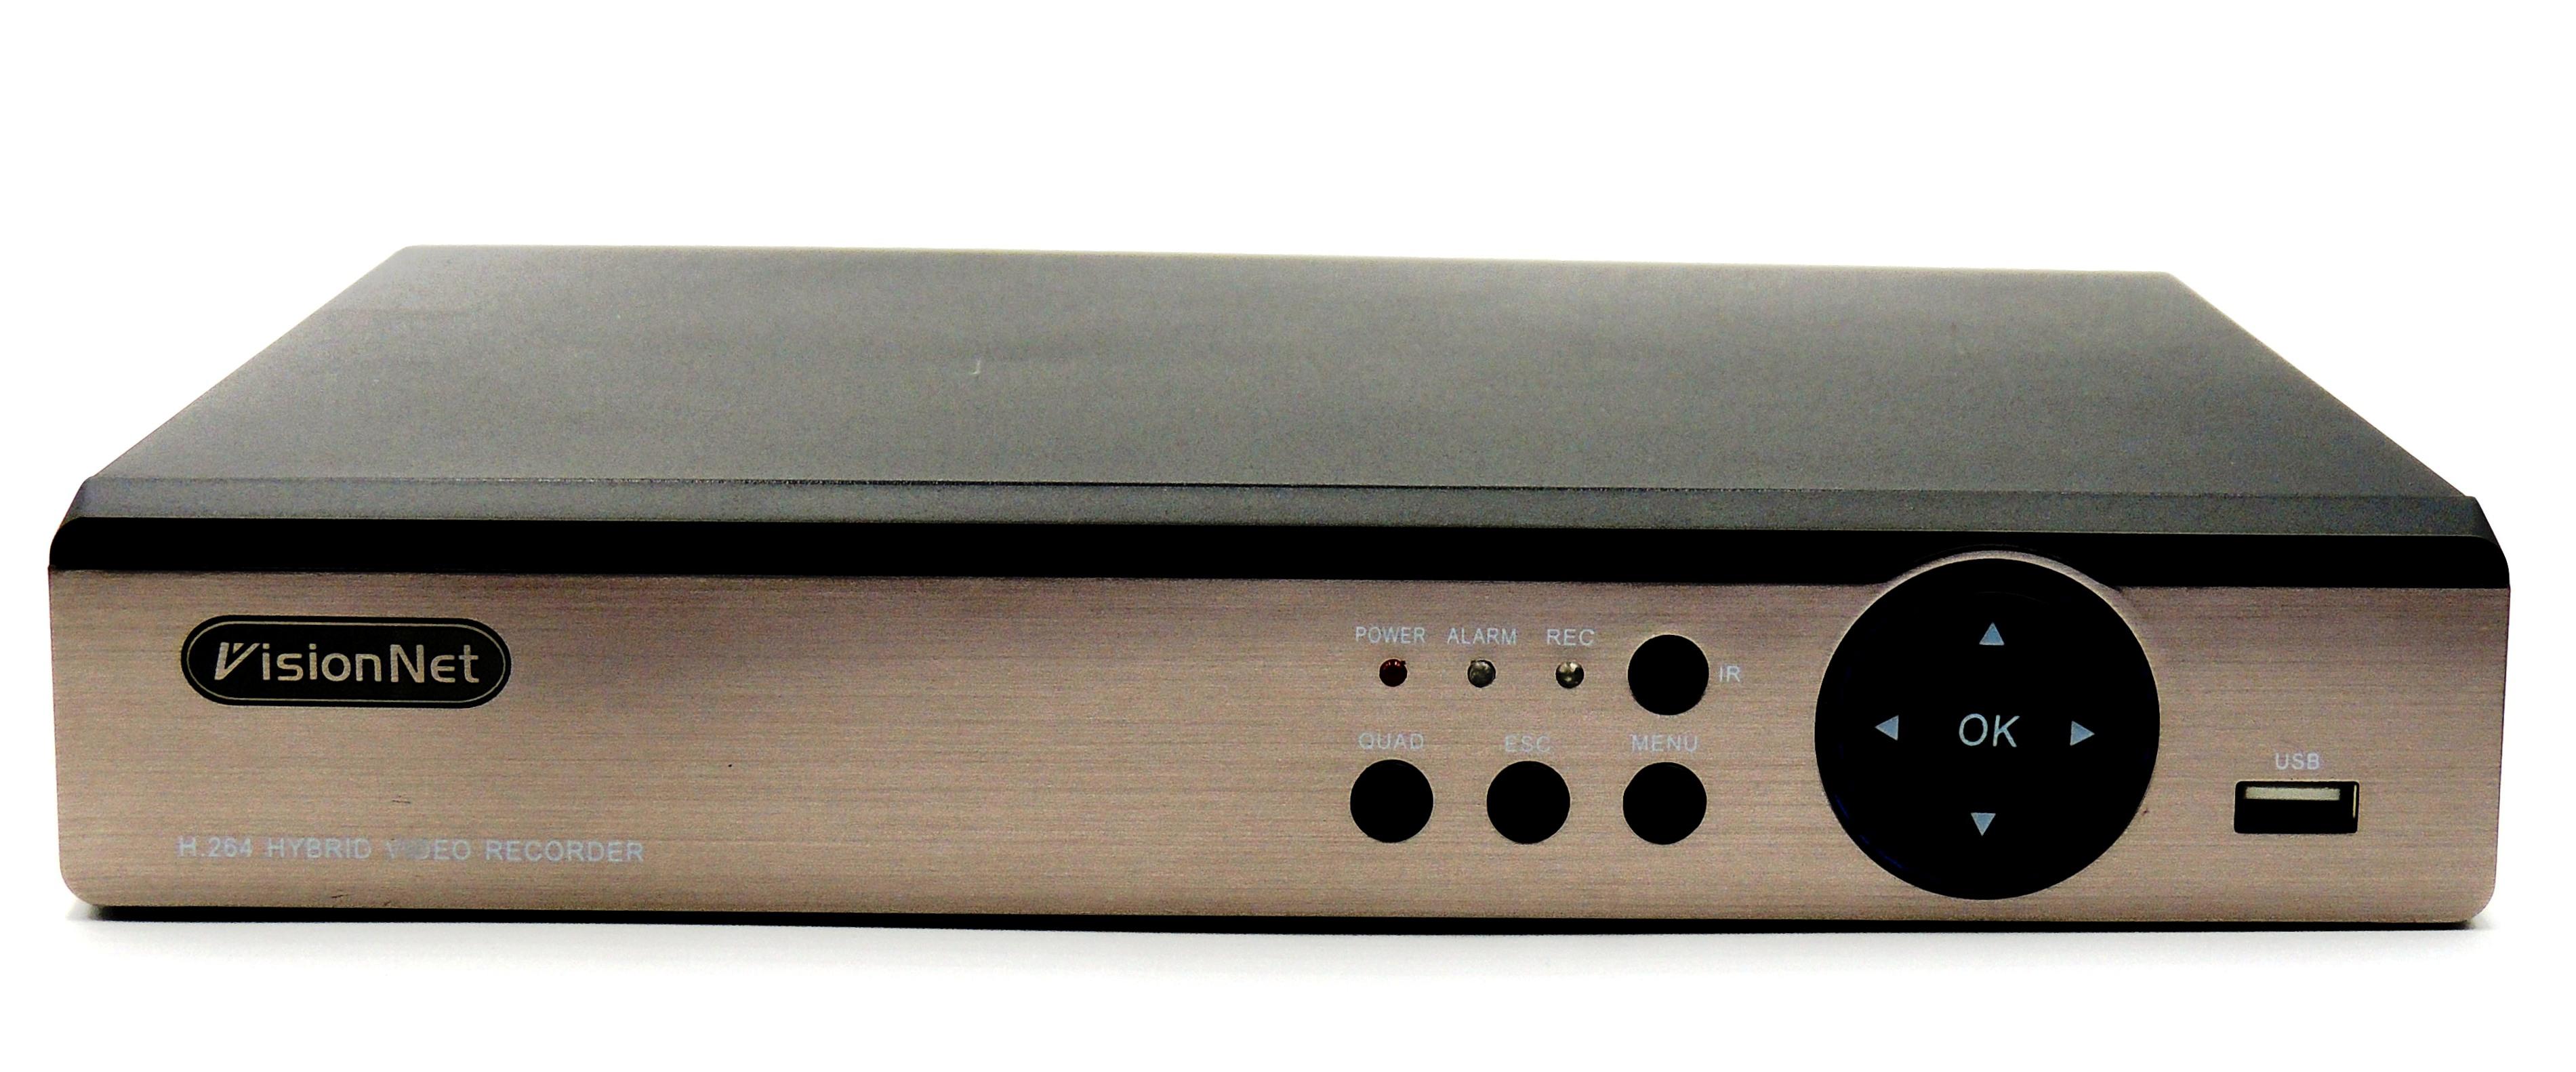 VISIONNET VN-4004 XMEYE ΚΑΤΑΓΡΑΦΙΚΟ 4 ΚΑΝΑΛΙΩΝ Hybrid 2.0 MP  (XVI TVI CVI AHD IP Analog)   Onl   Snif.gr 6f541bf2b3c3